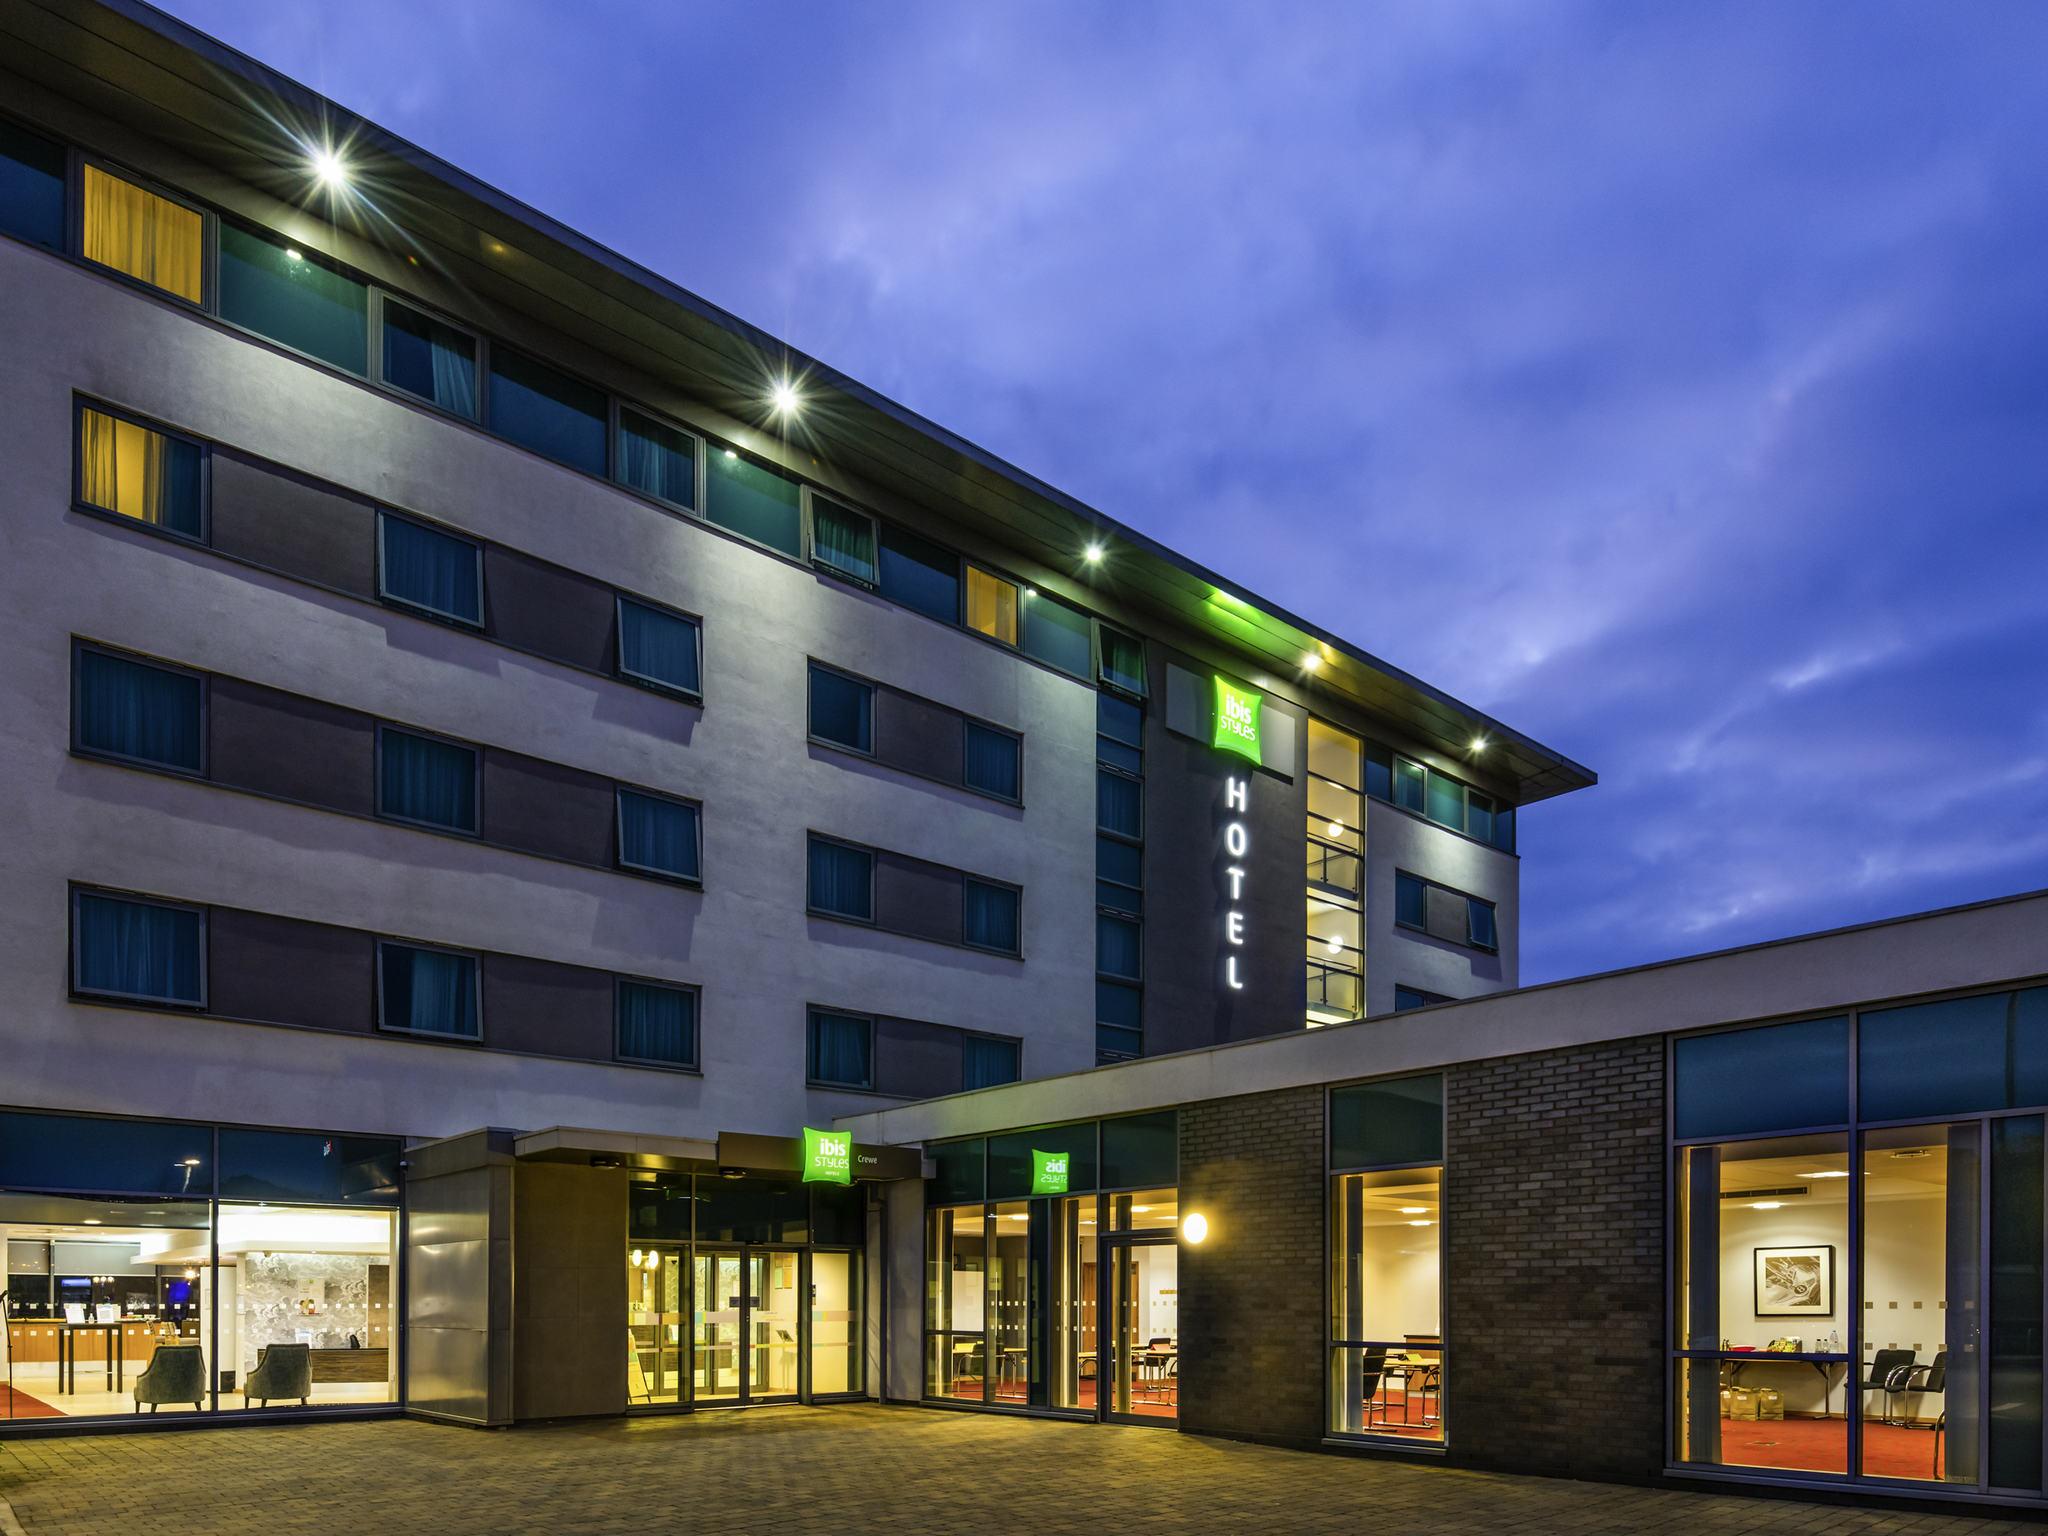 Hotel ibis Styles Crewe Hotel in